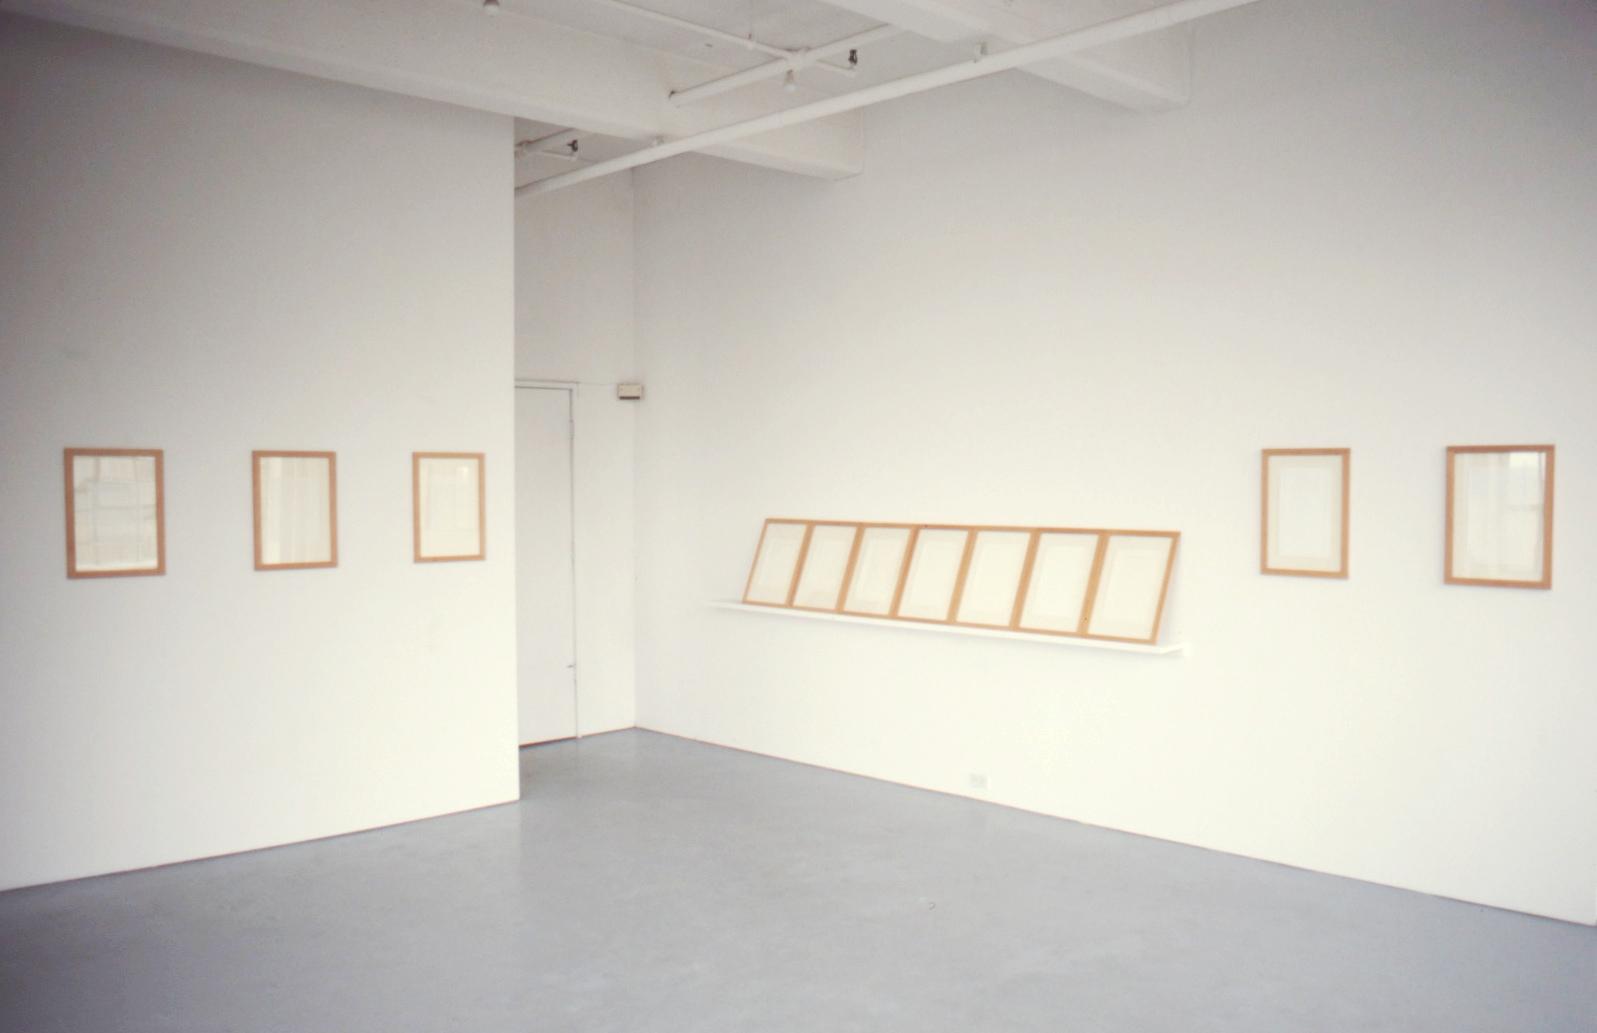 Serge Spitzer at Lawrence Markey 1995 3.jpeg